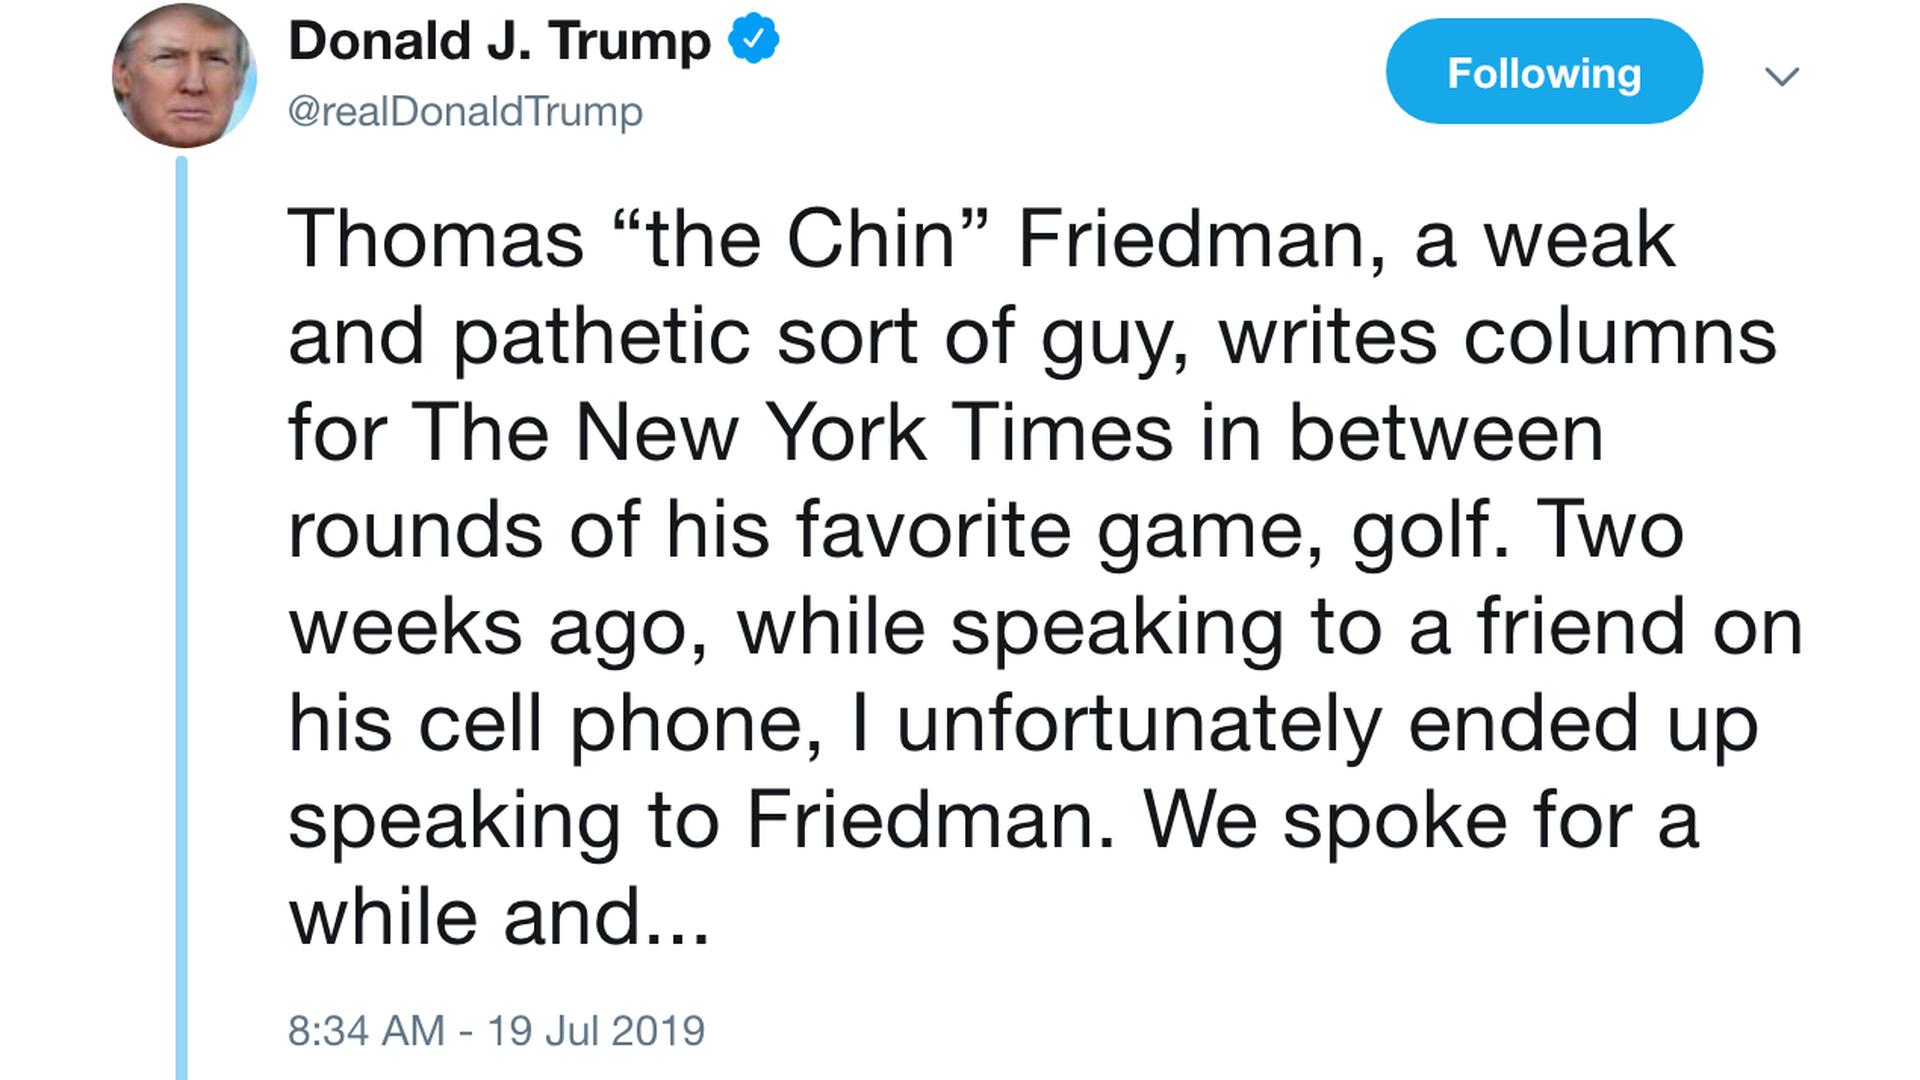 Trump rips New York Times columnist Thomas Friedman on